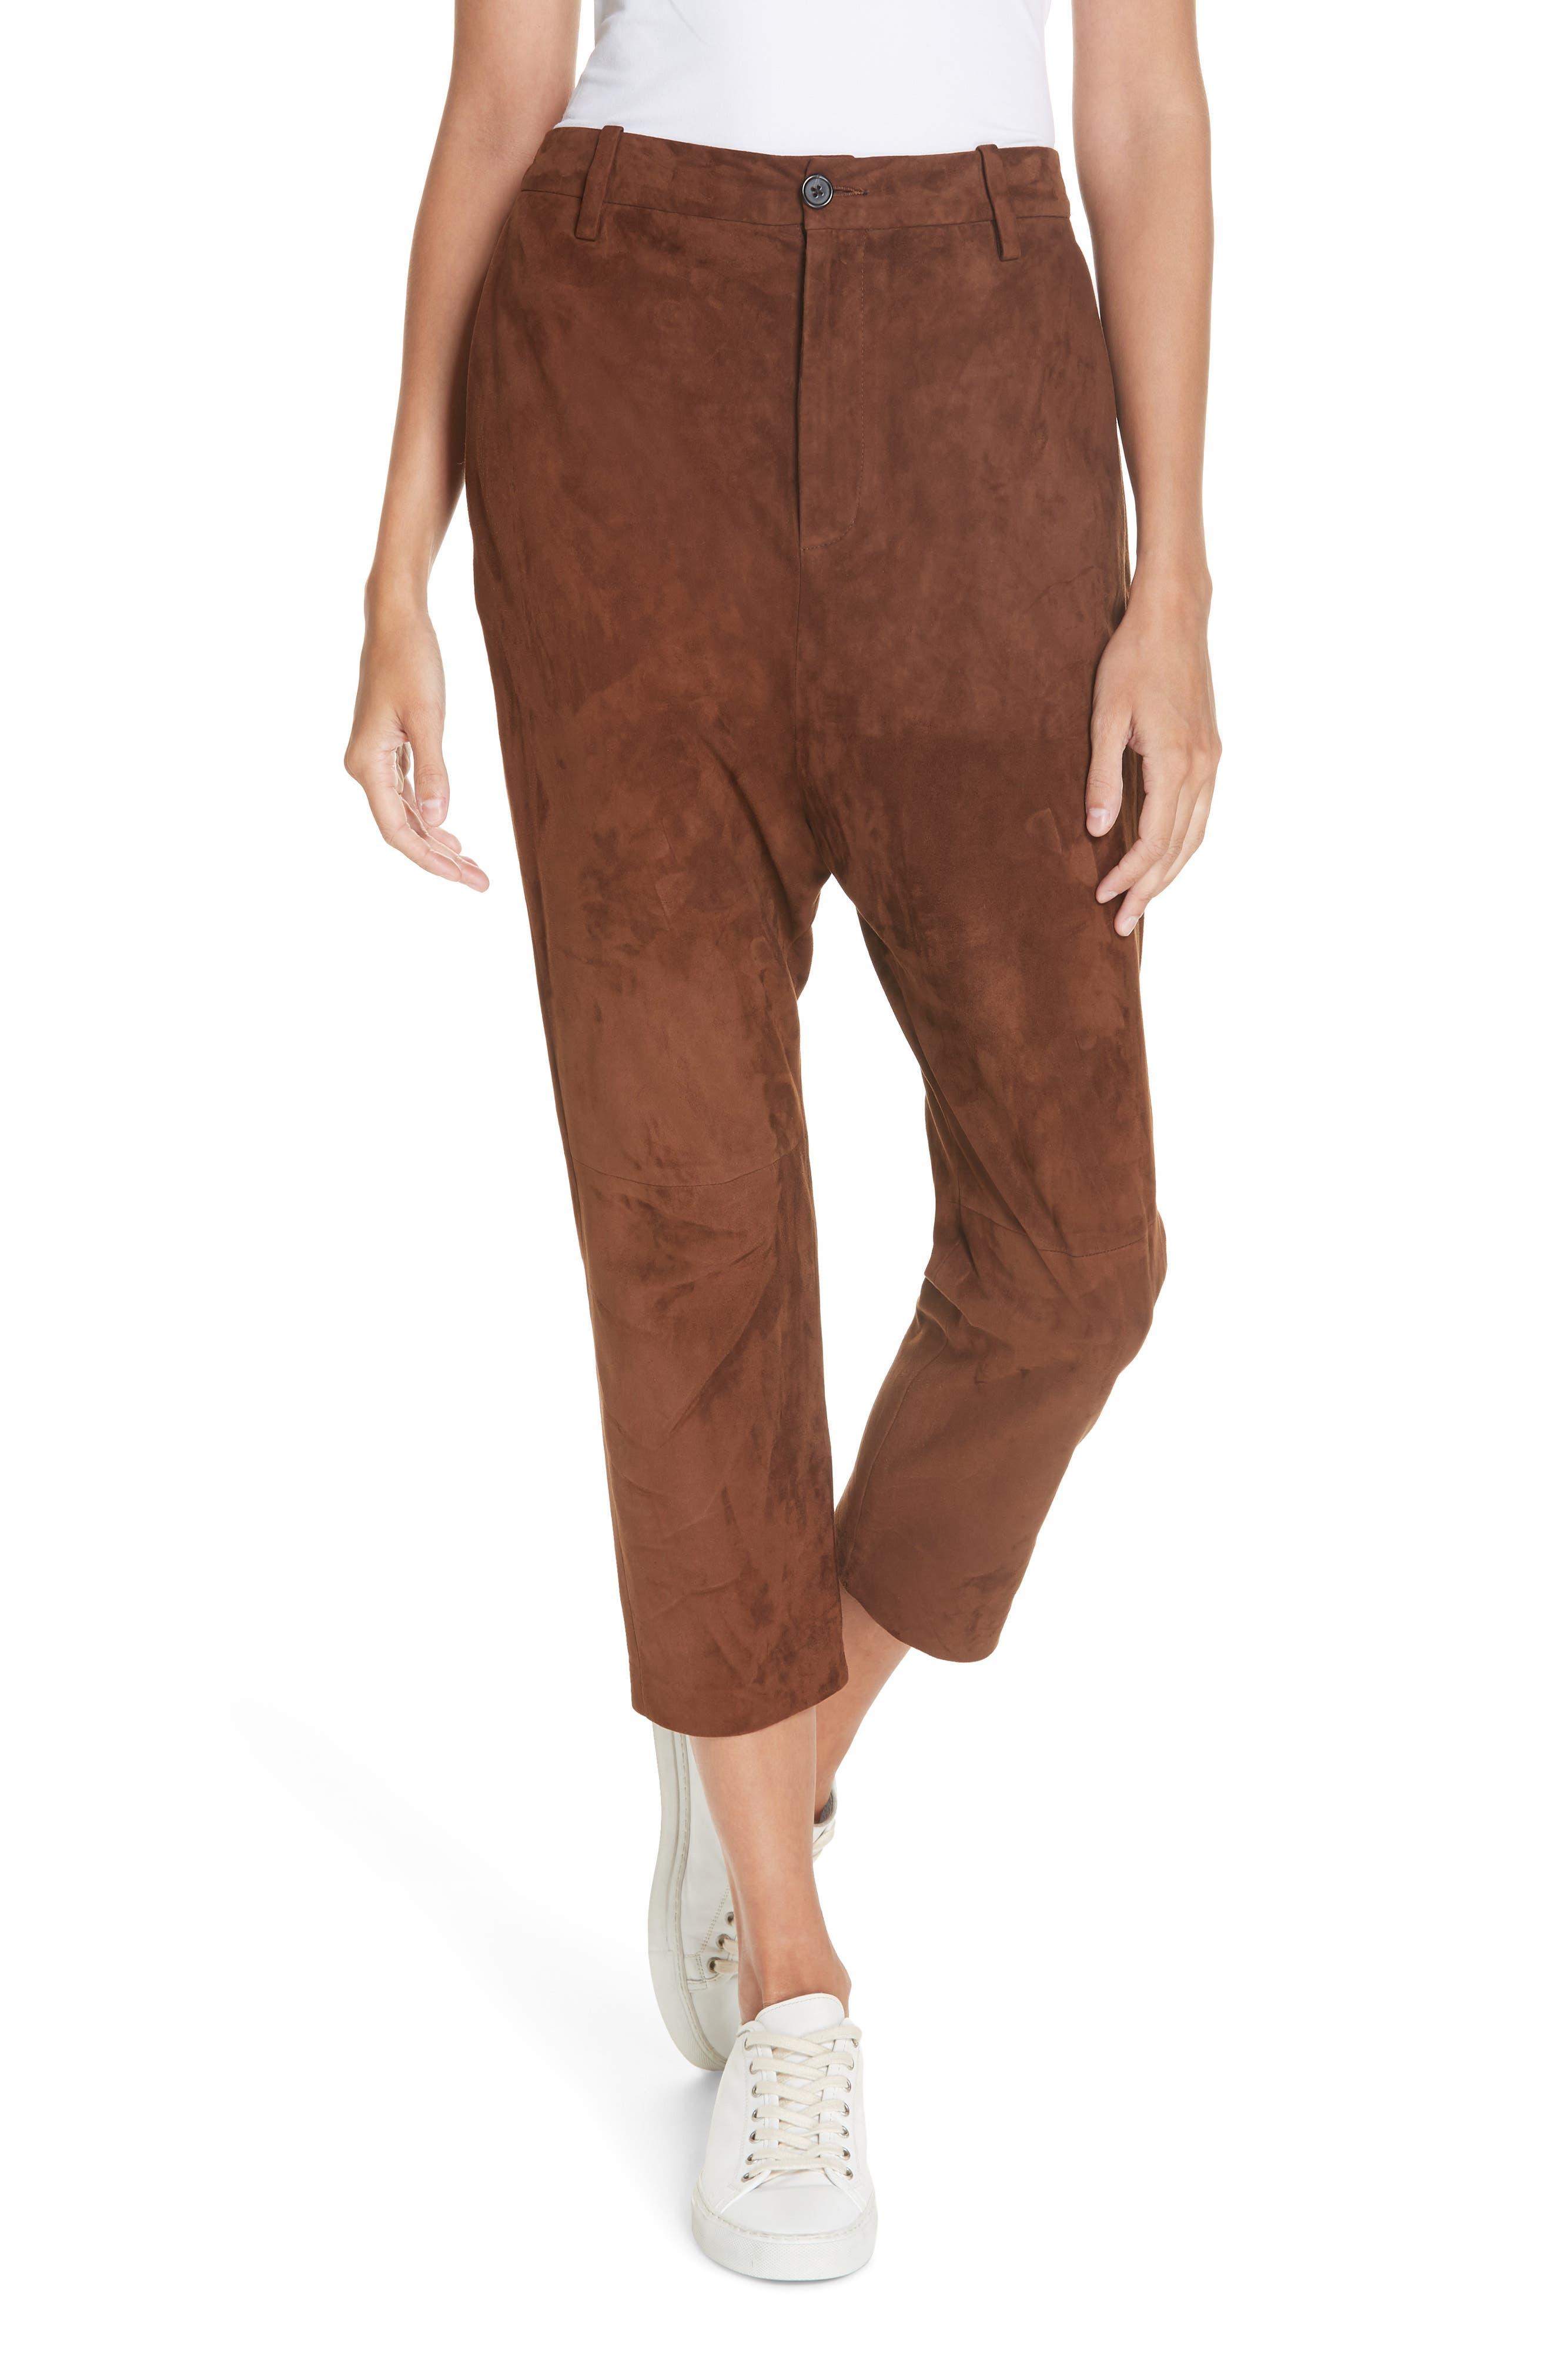 NILI LOTAN Paris Leather Pants, Main, color, DARK COGNAC